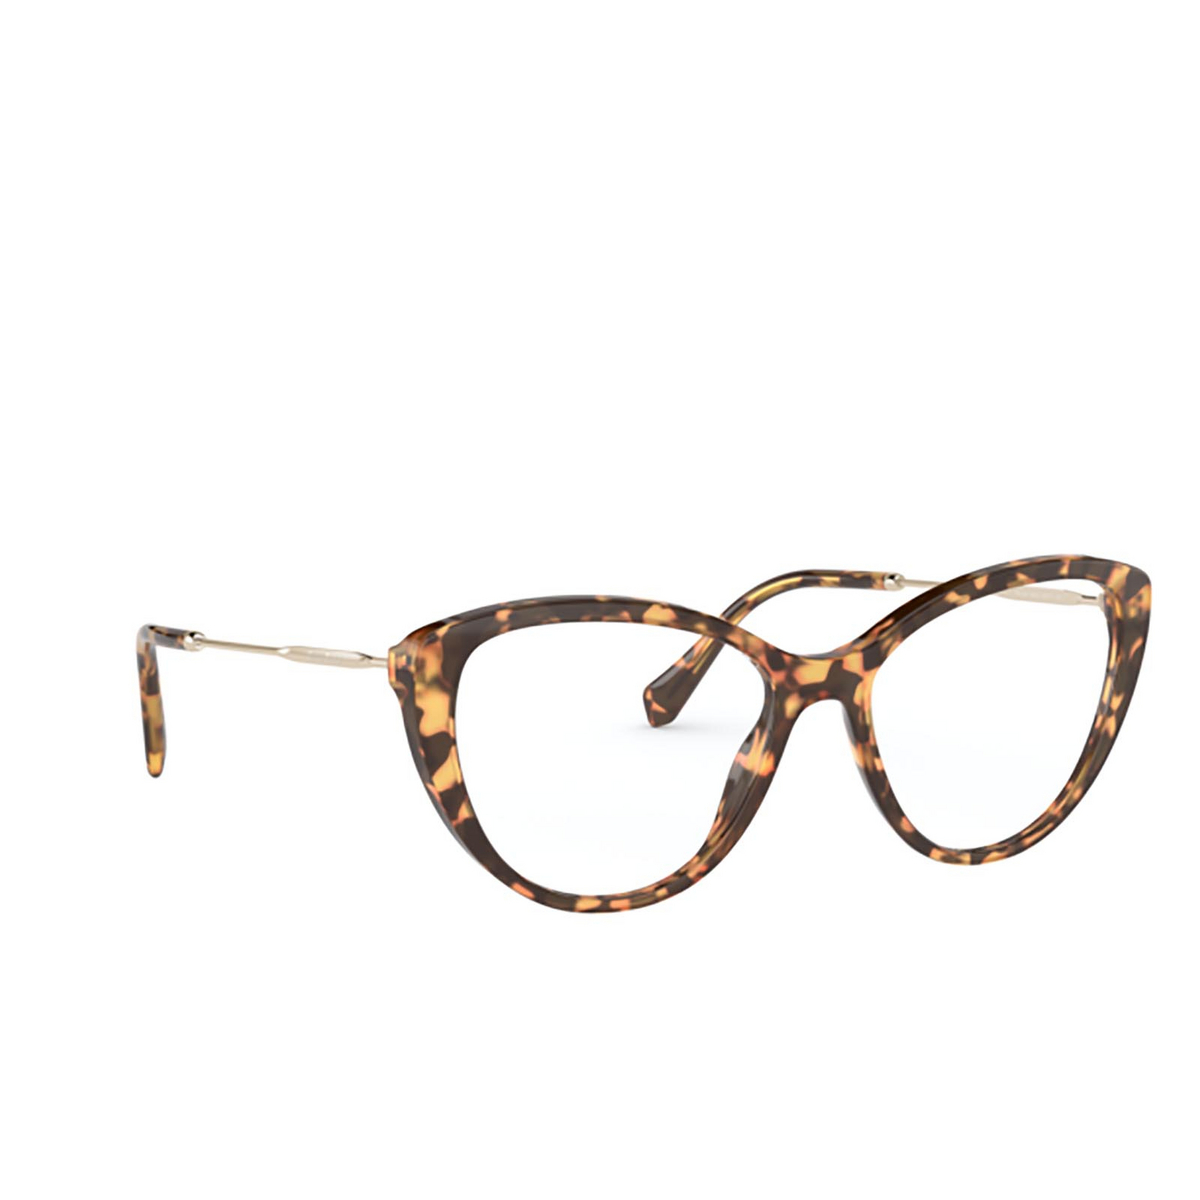 Miu Miu® Cat-eye Eyeglasses: MU 02SV color Light Havana 7S01O1 - three-quarters view.